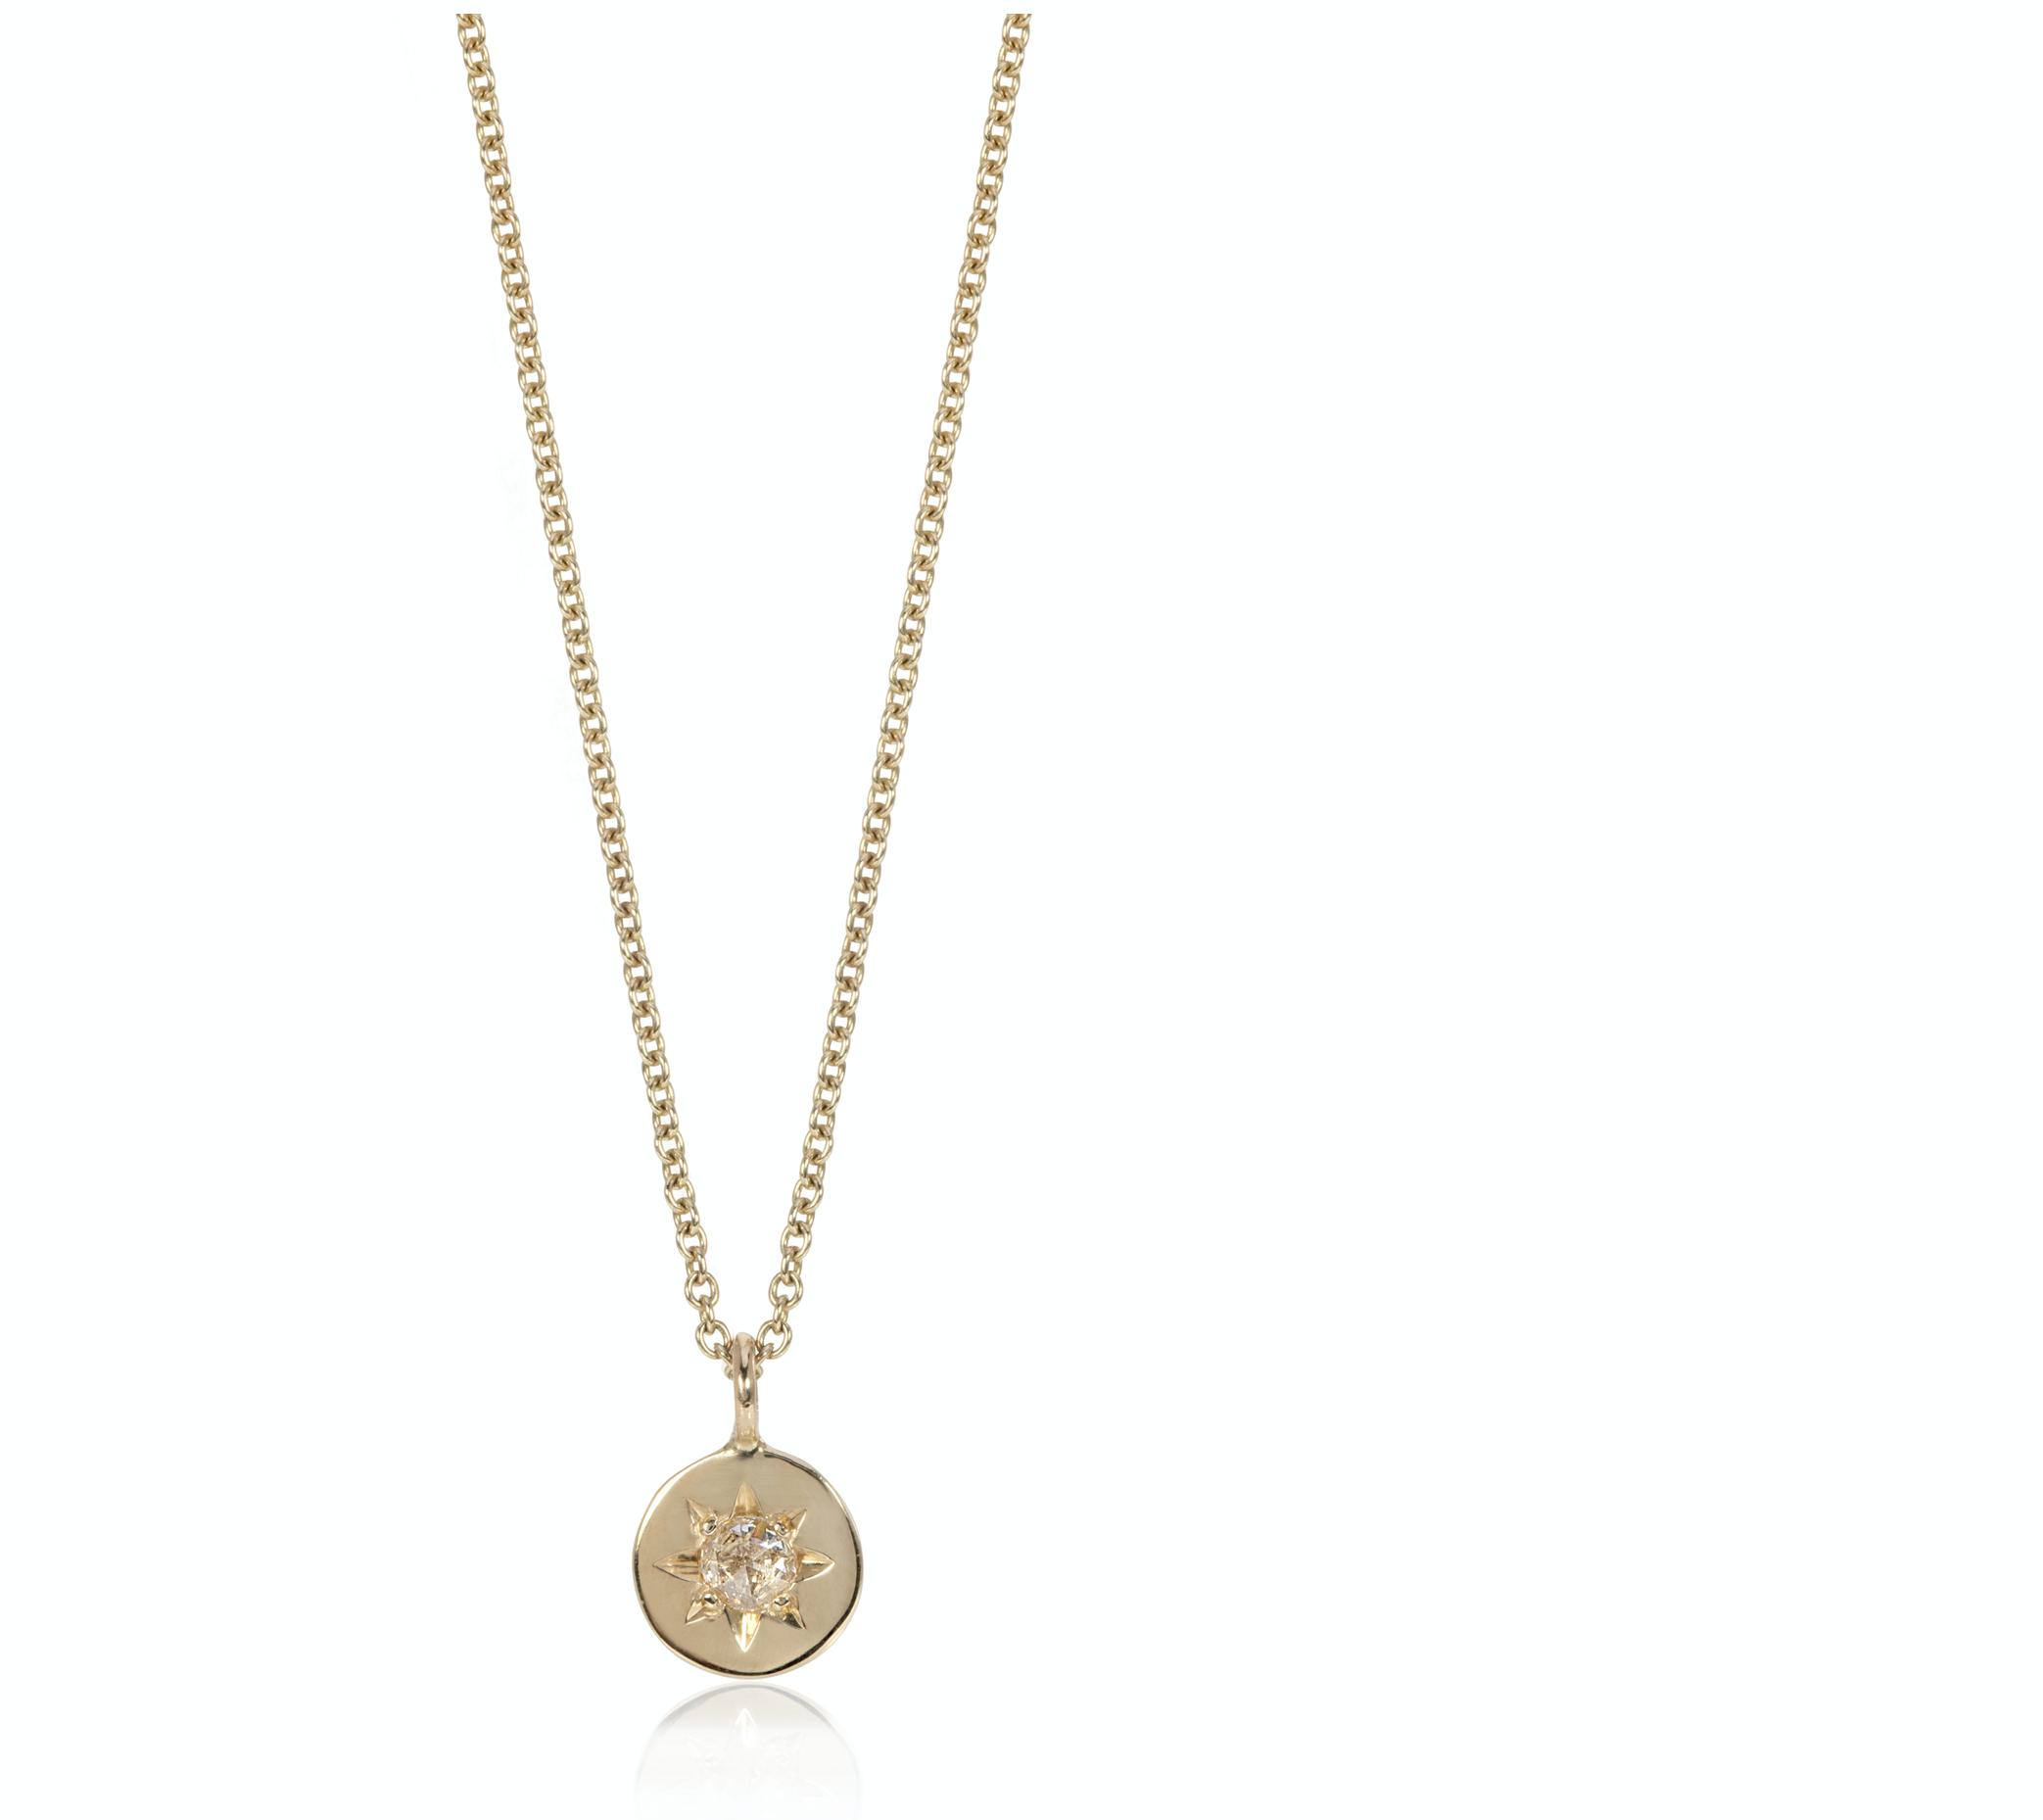 Sunburst rose cut diamond pendant, £600, ellieair.co.uk